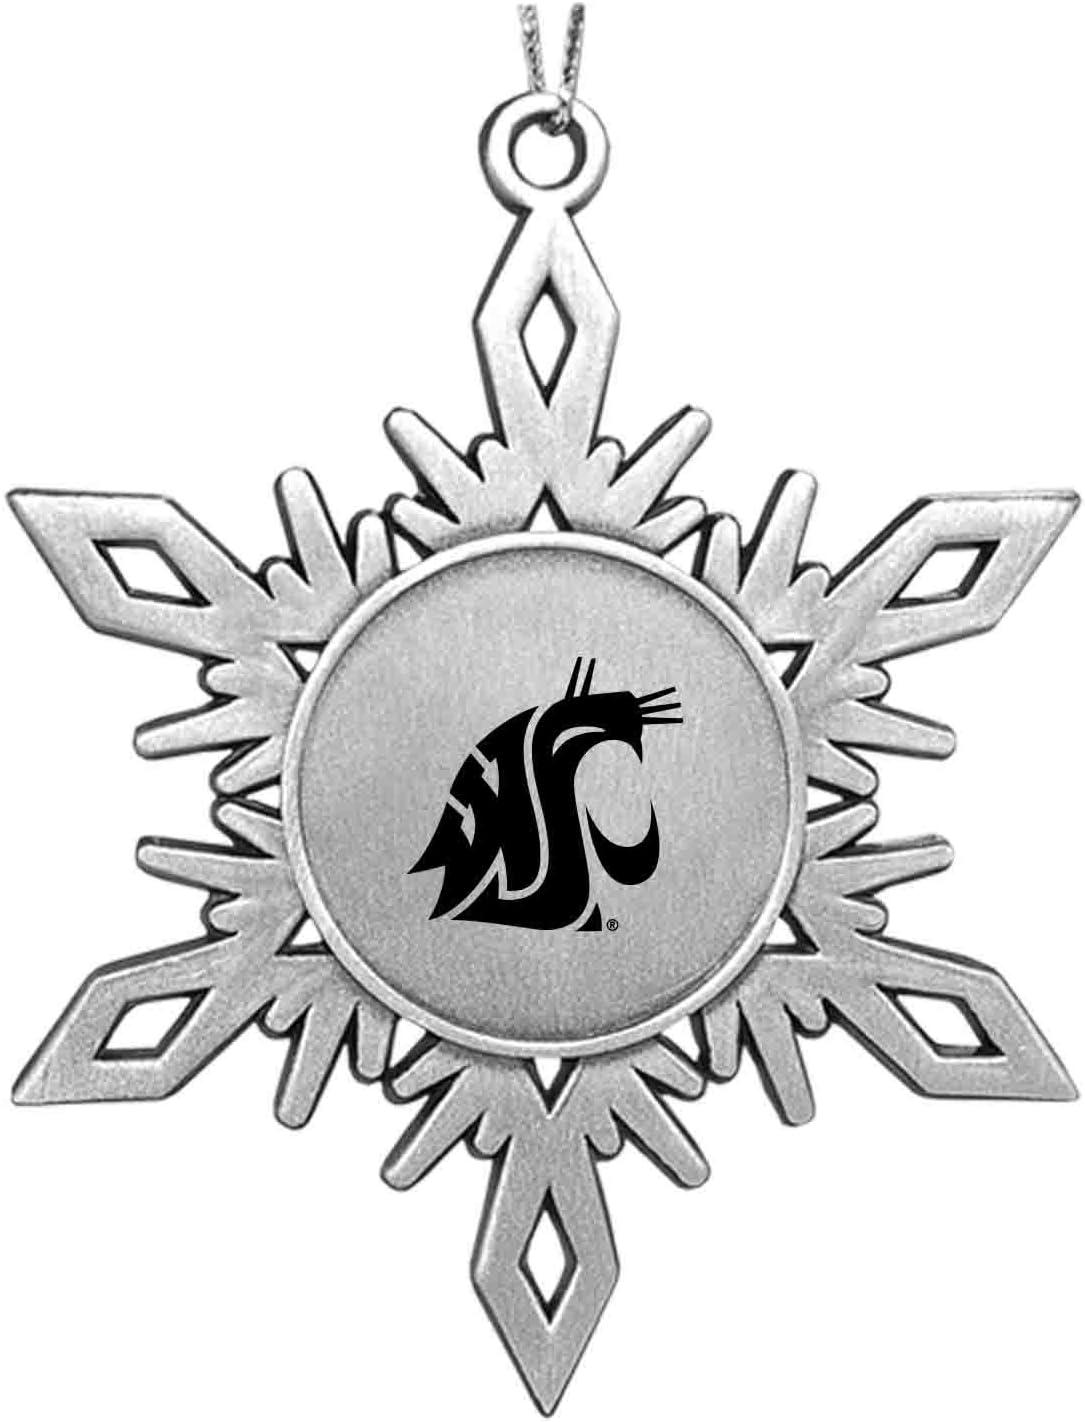 LXG, Inc. Washington State University|Snowflake Ornament|Pewter